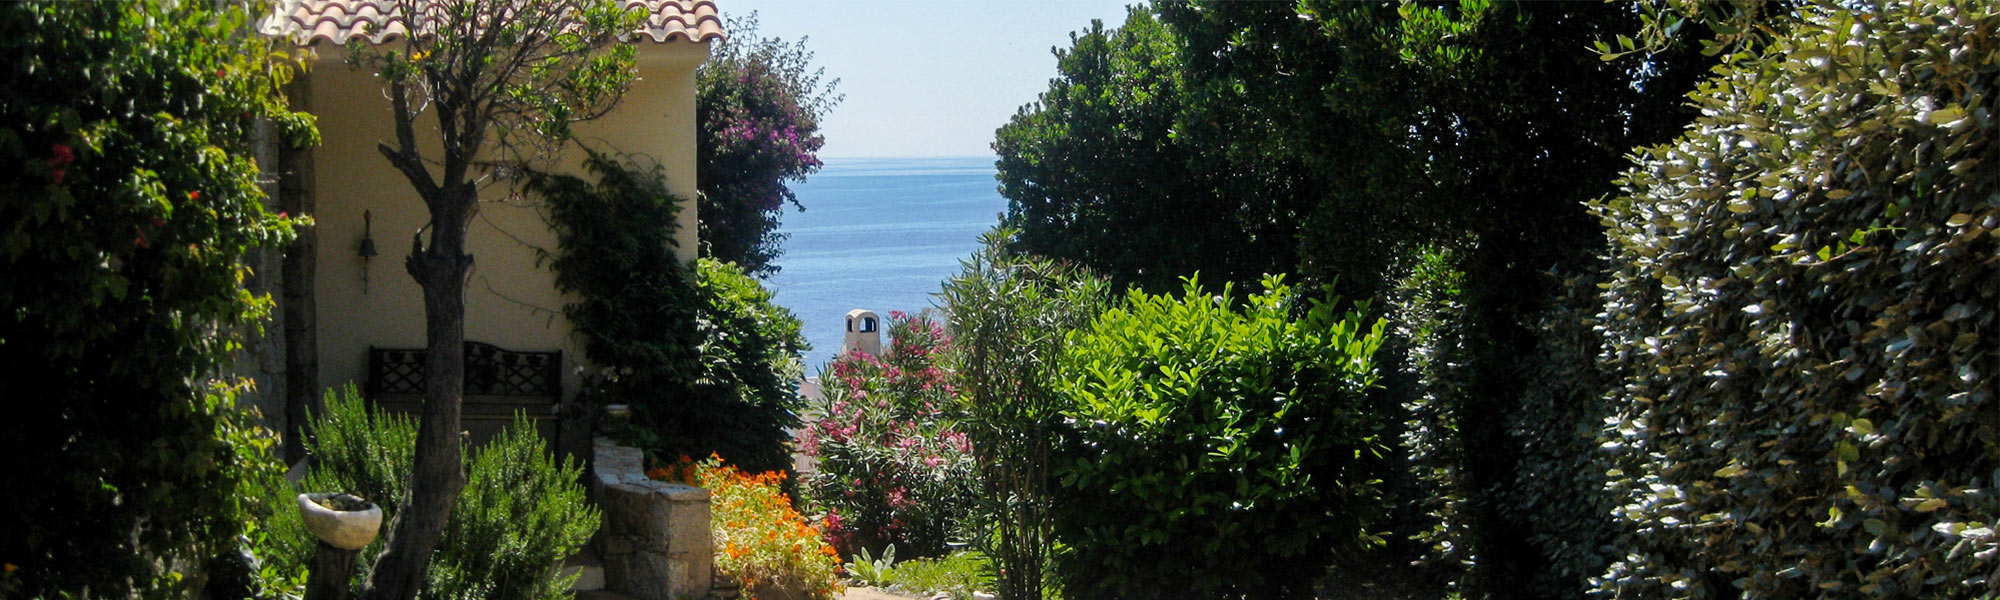 Vermittelte Immobilie in Korsika